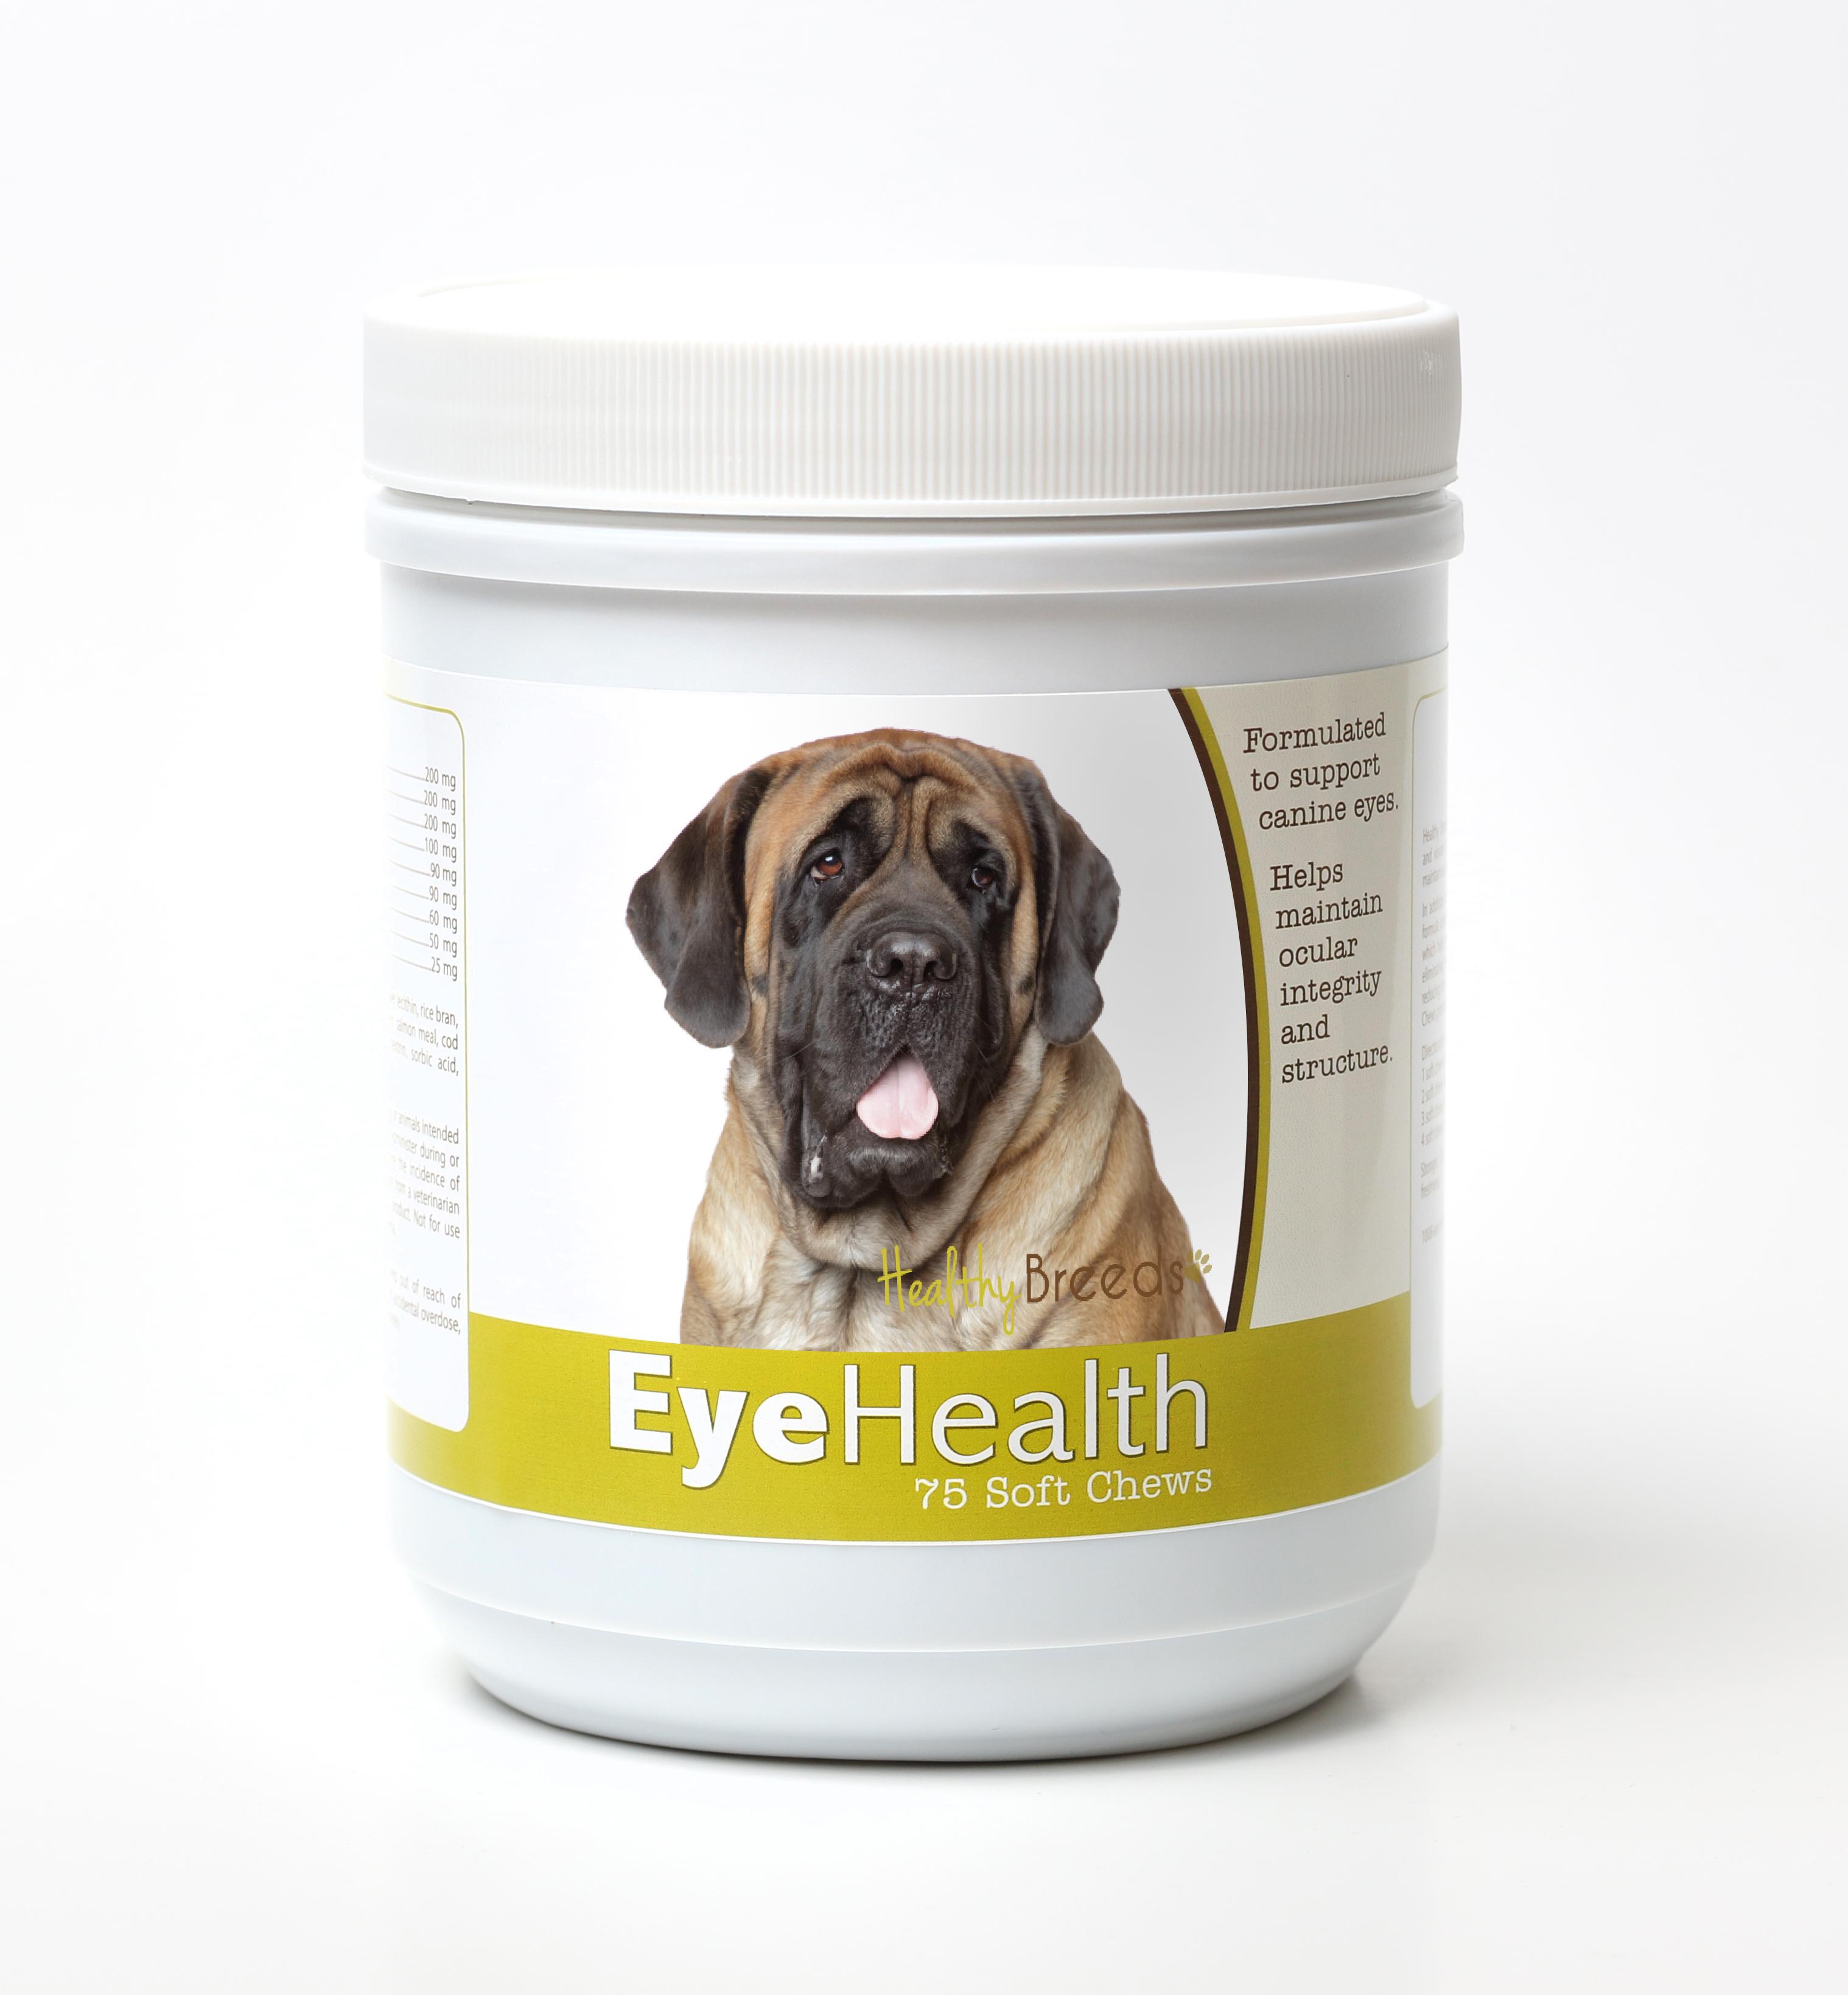 Healthy Breeds Dog Eye Health Support Soft Chews for Mastiff 75 Count